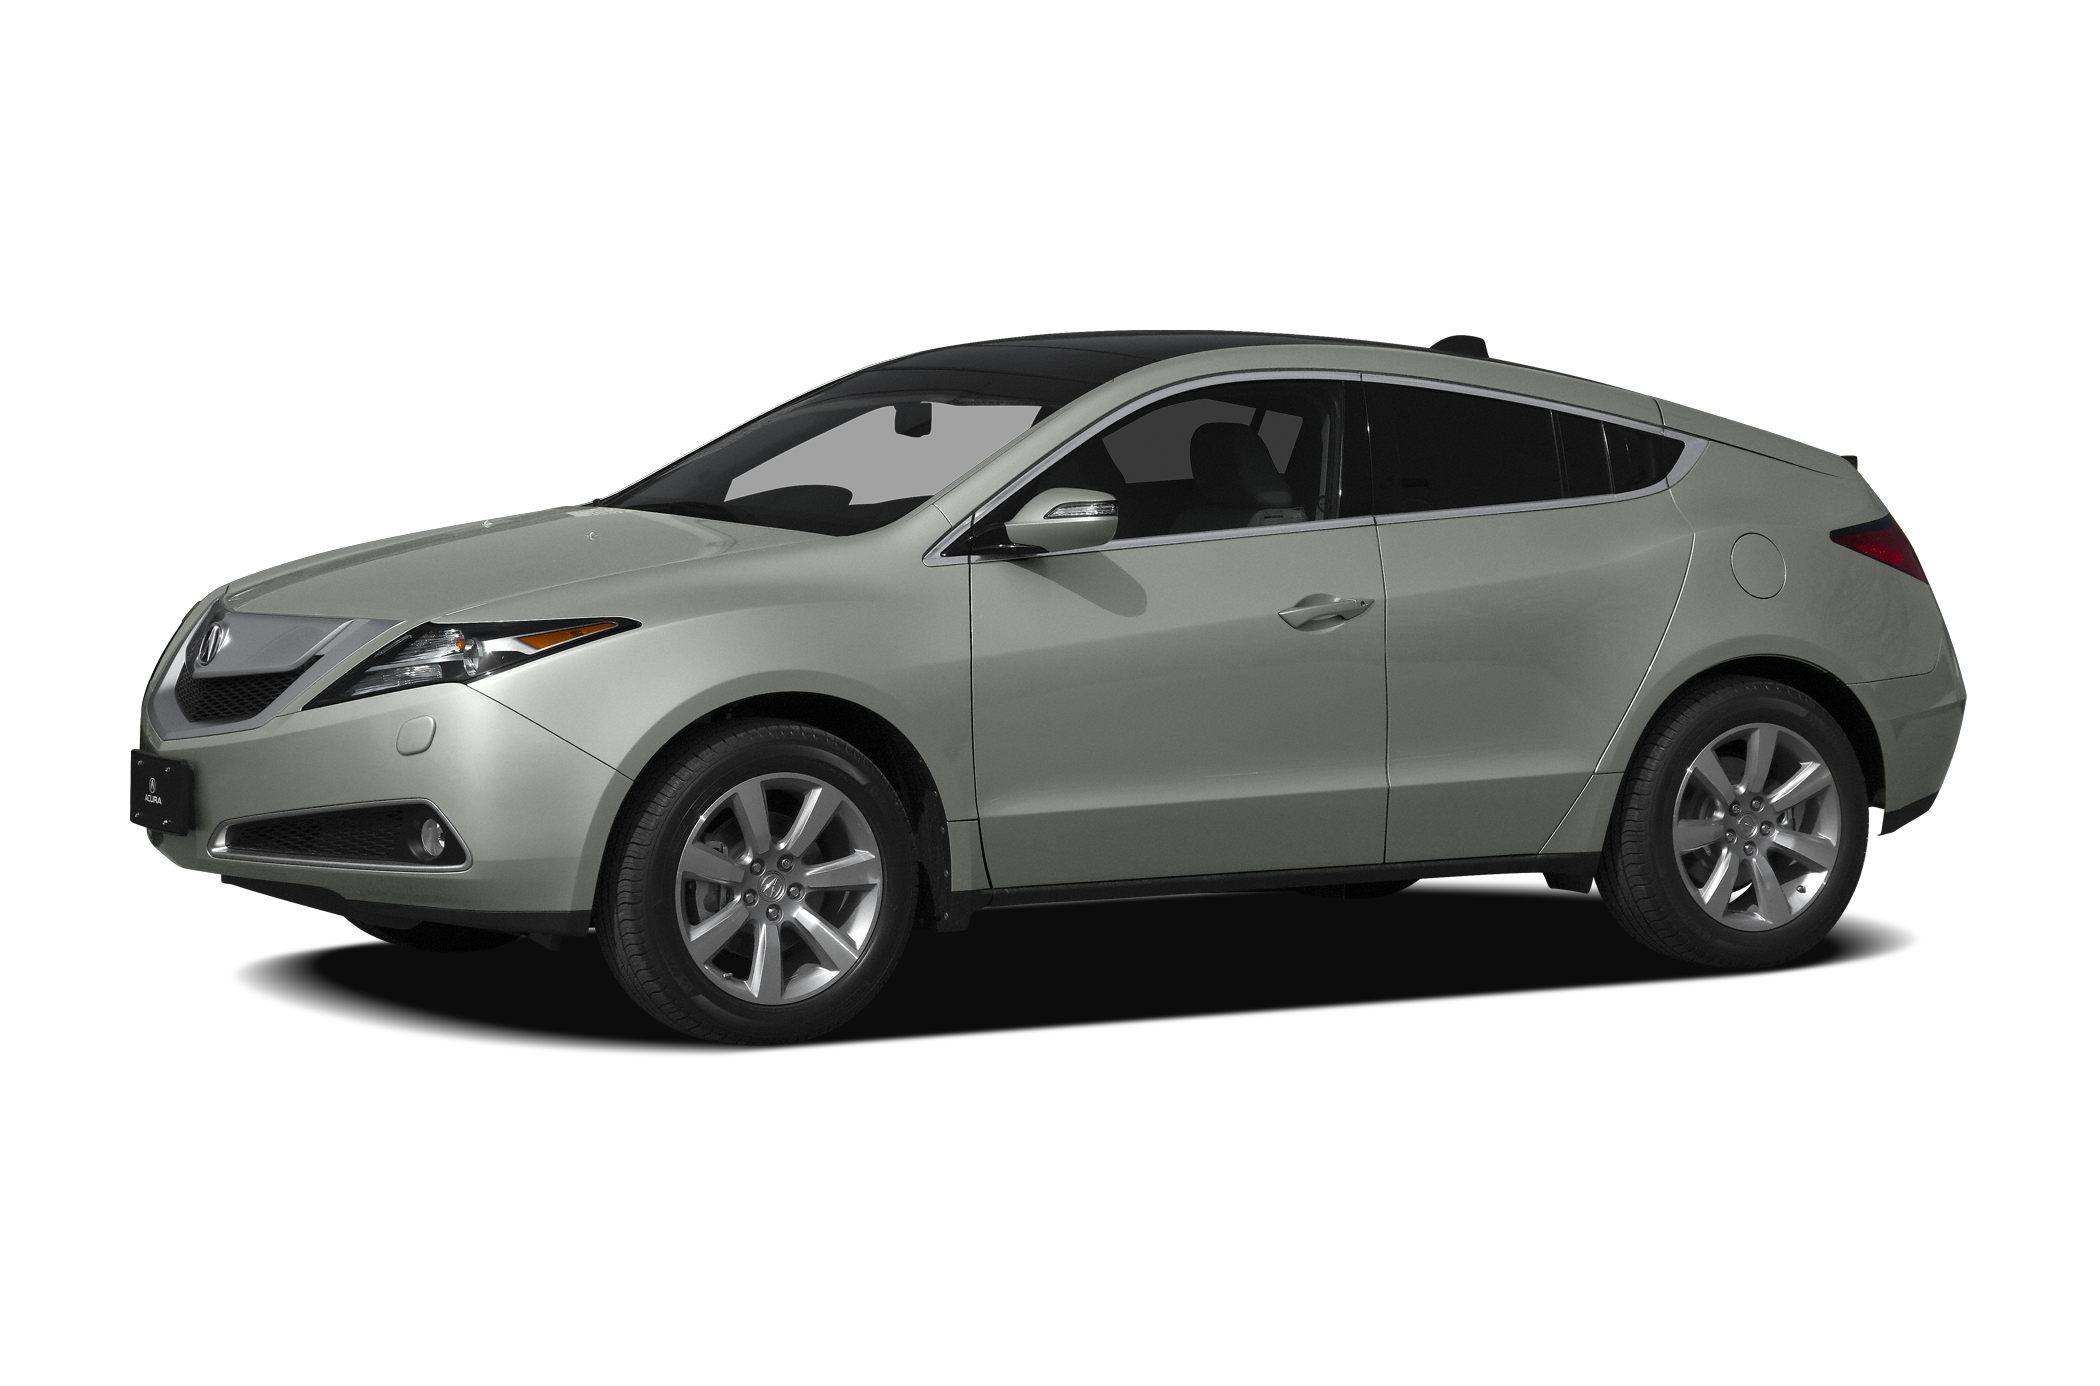 2010 Acura ZDX Safety Recalls